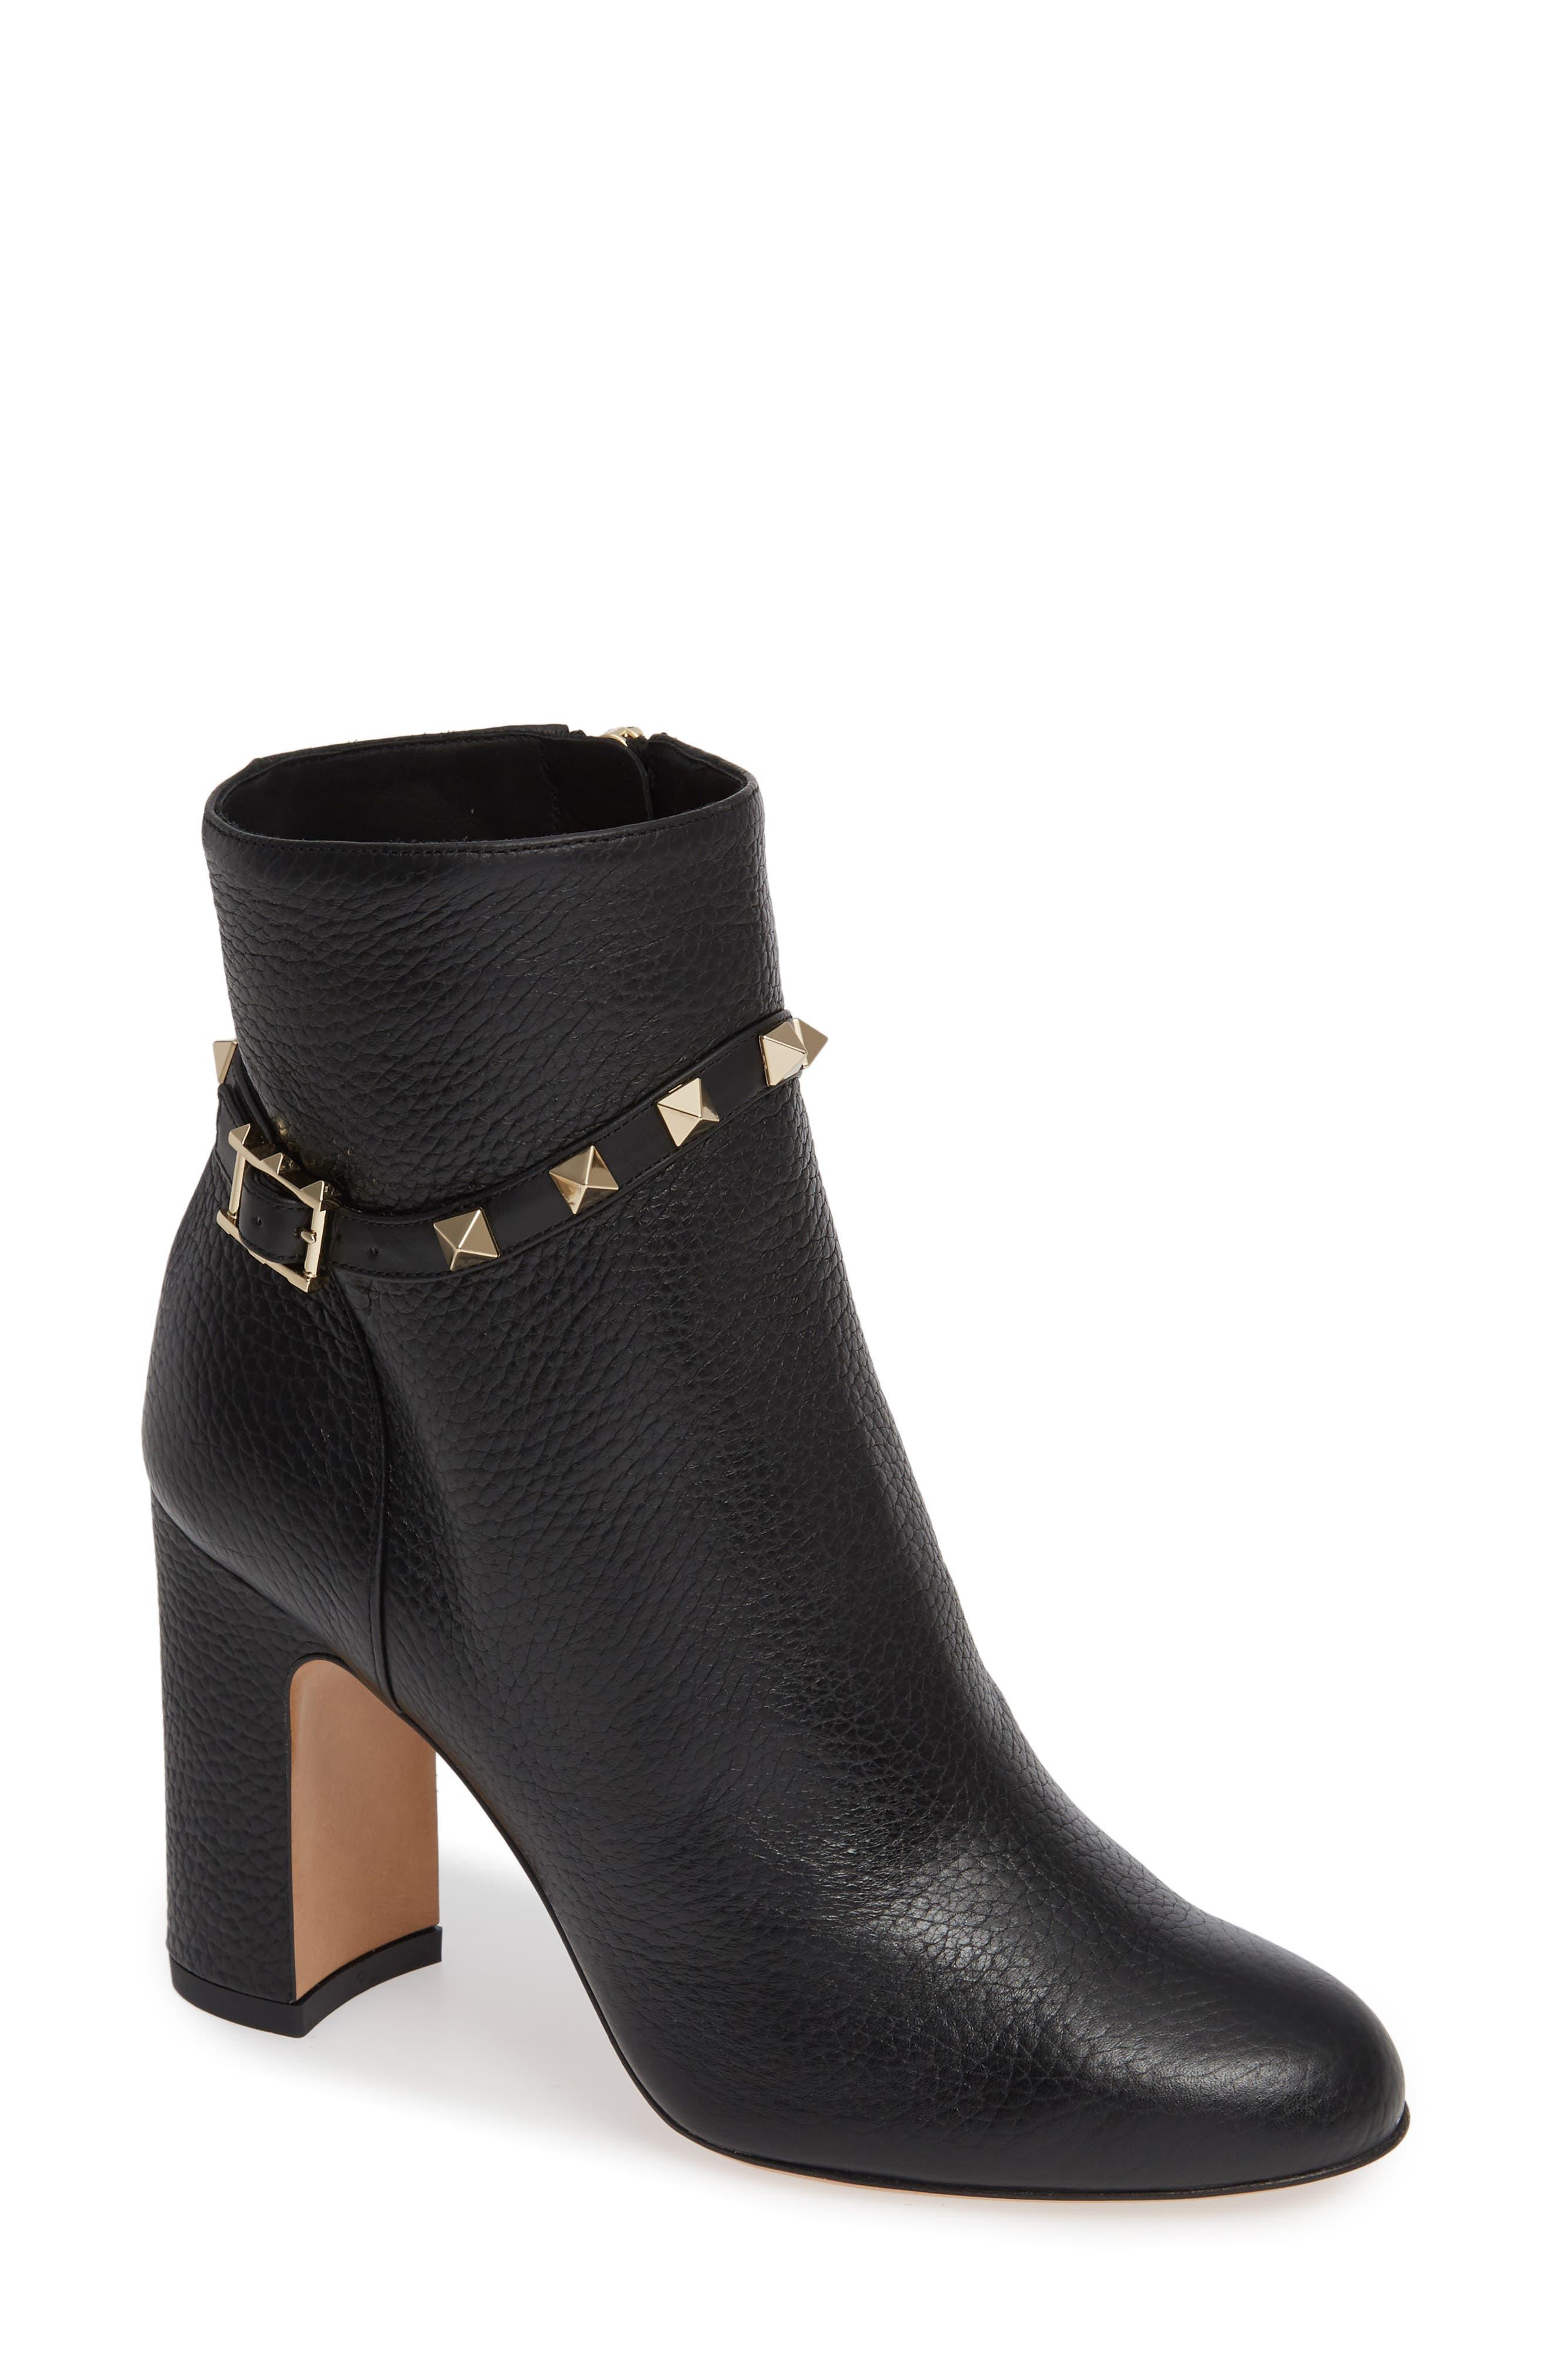 Rockstud Pebbled Leather Ankle Booties in Black